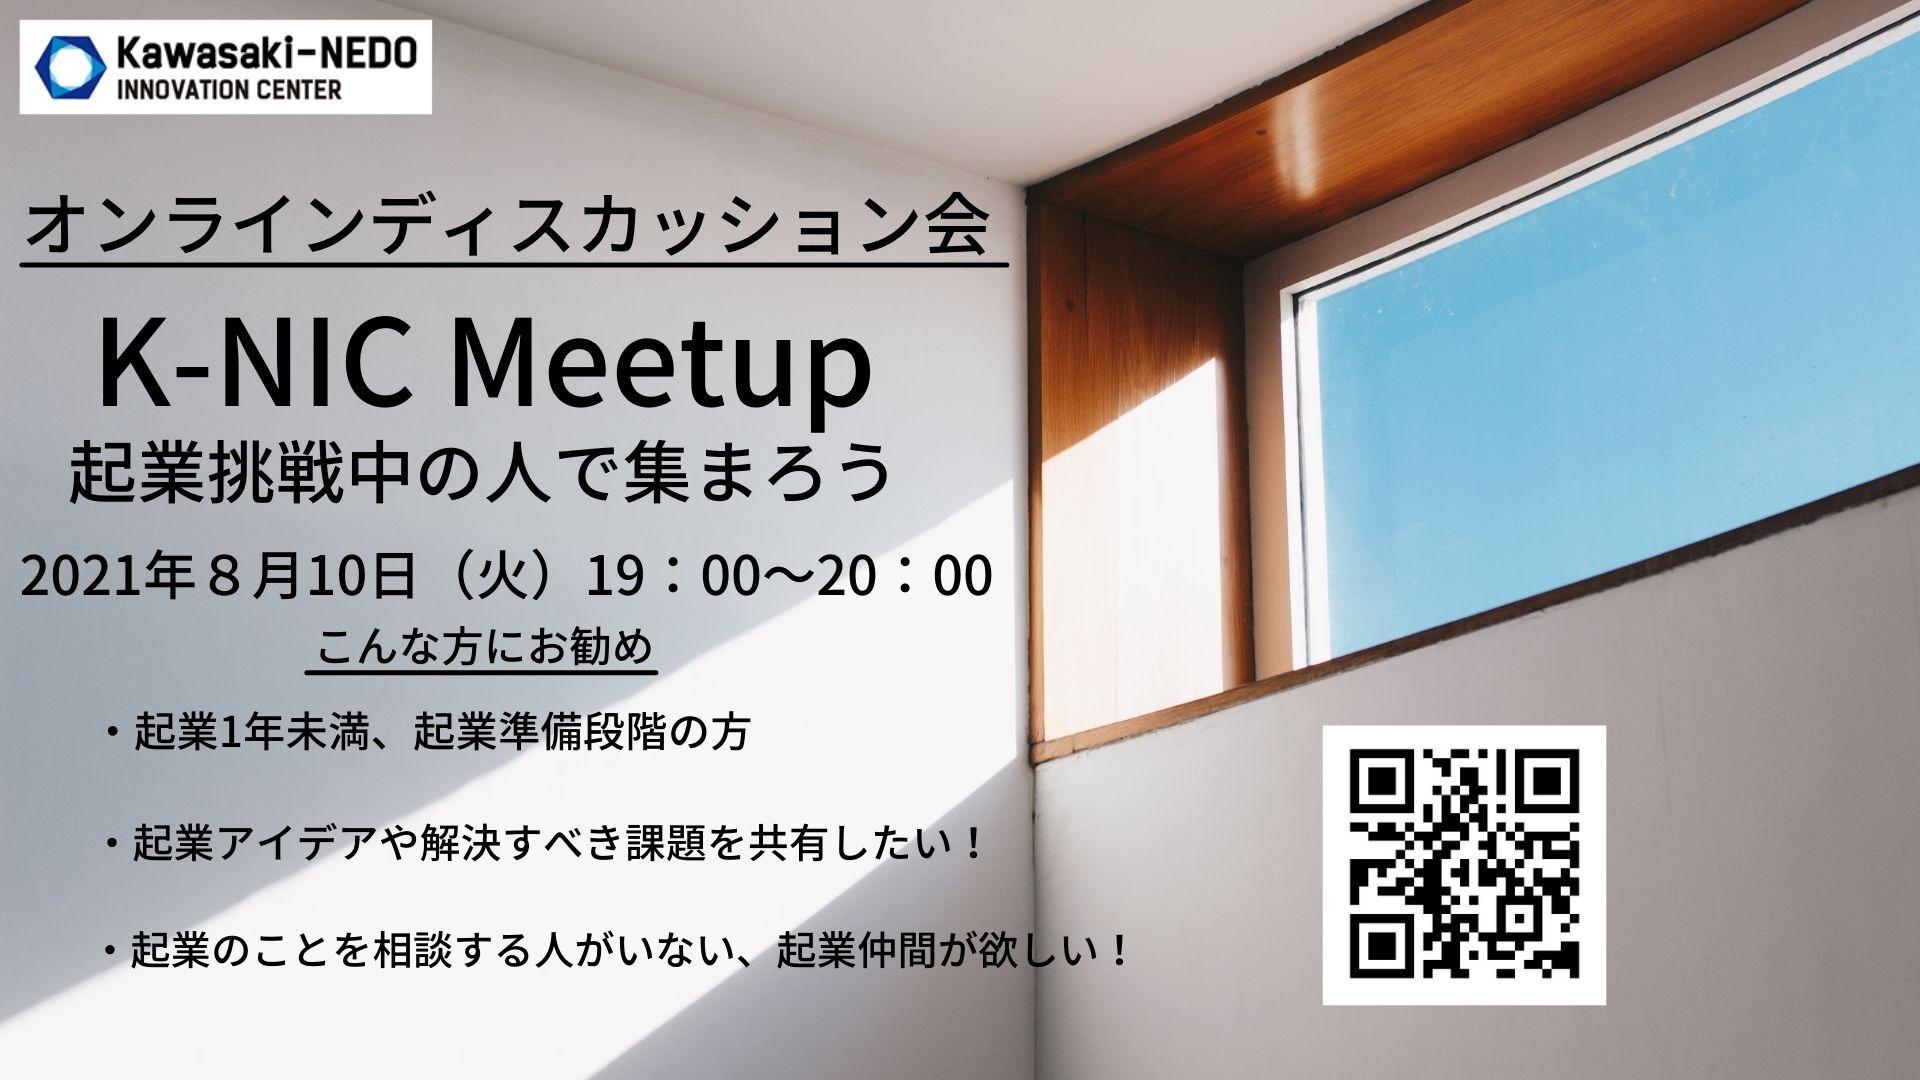 【8/10】K-NIC Meetup 起業挑戦中の人で集まろう